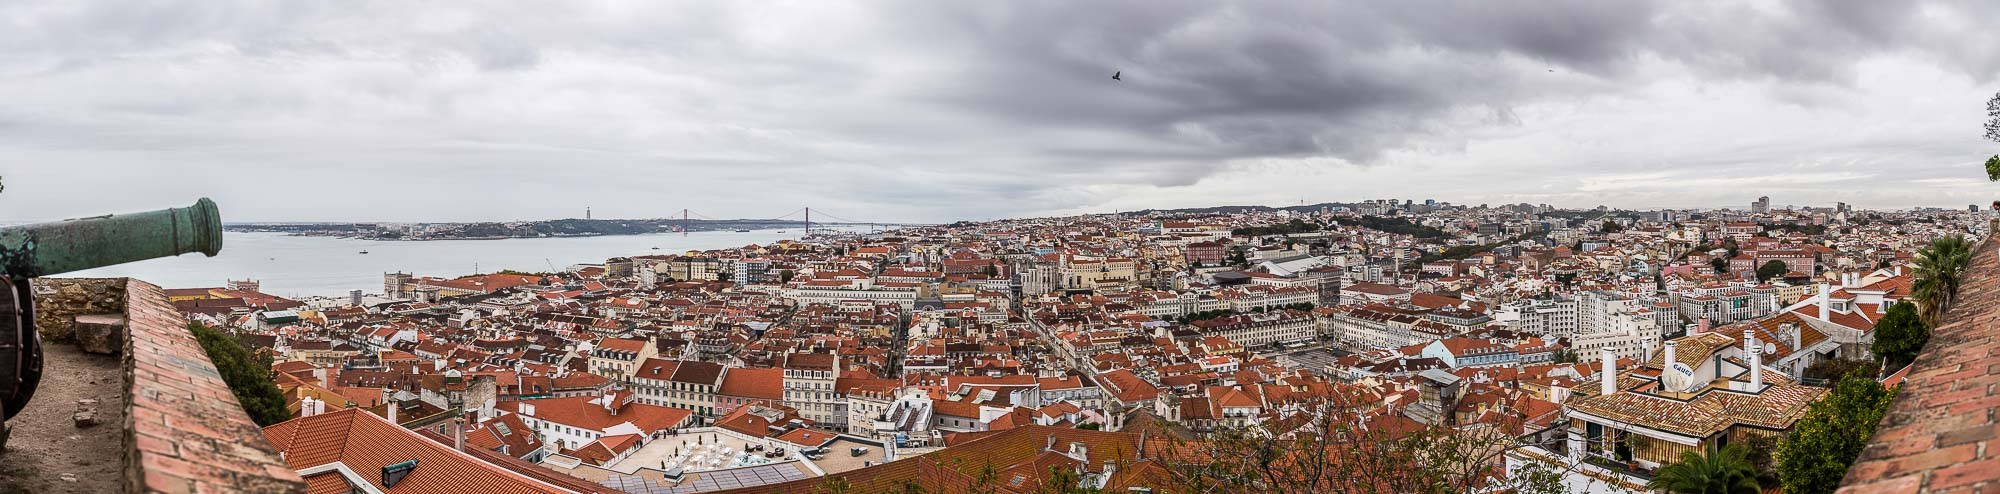 PORTUGAL-2012-jusmedic-#155-Pano